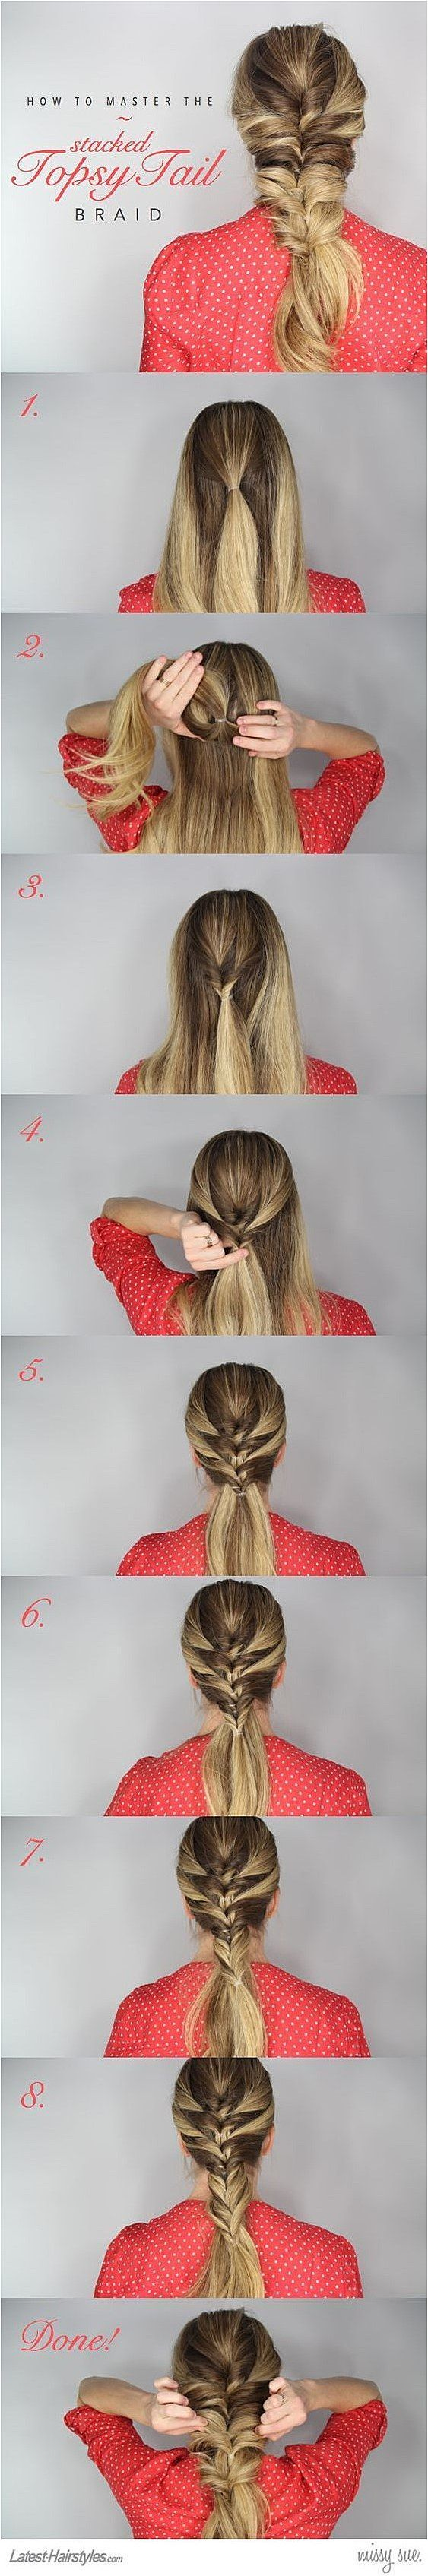 Diy hairstyle easybraid braidedhair click to see more hair